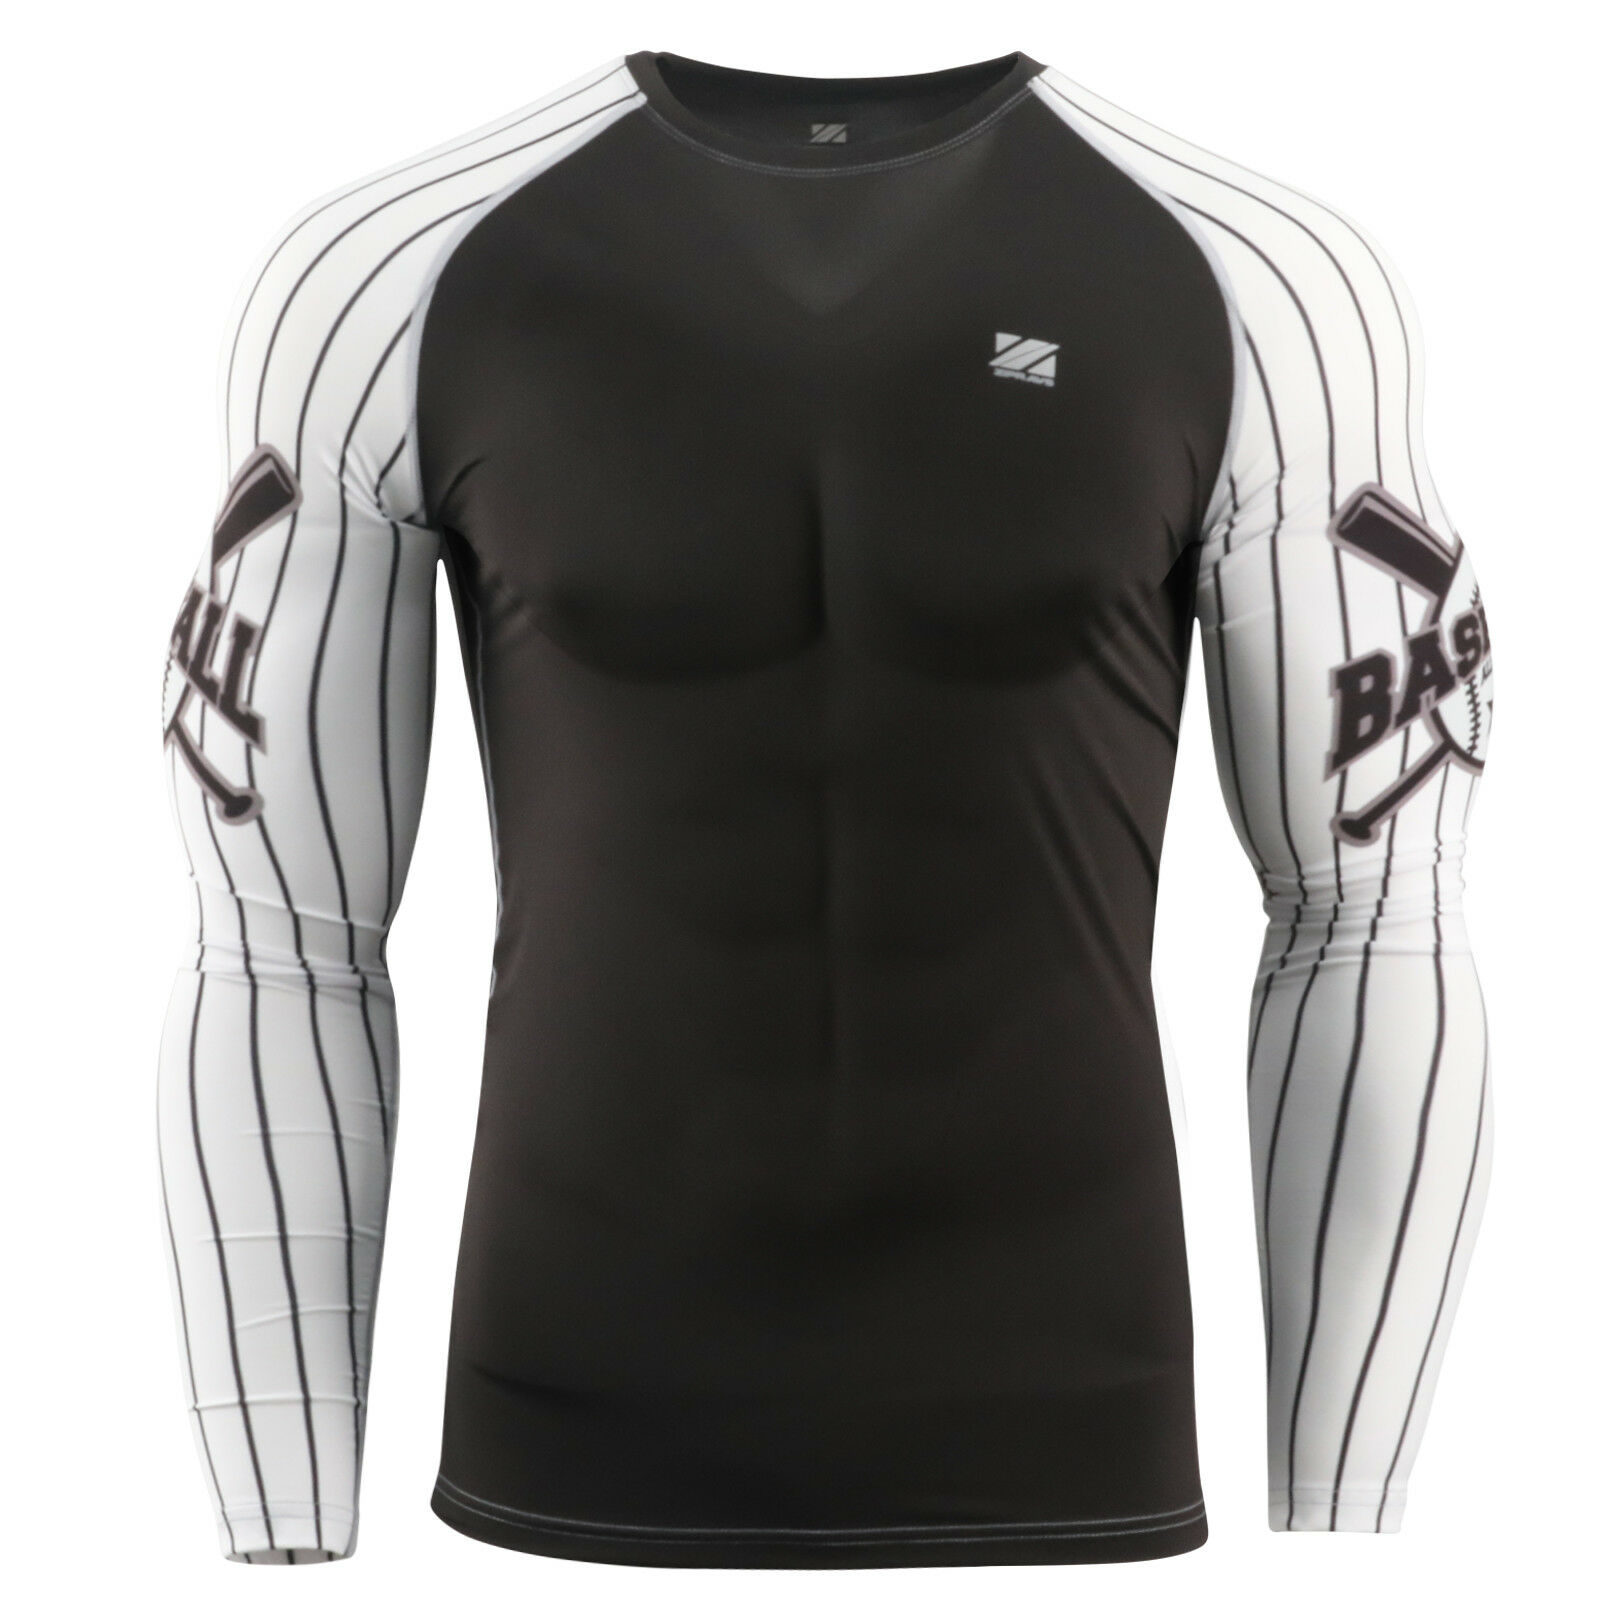 ZIPRAVS  sports compression shirts longsleeve